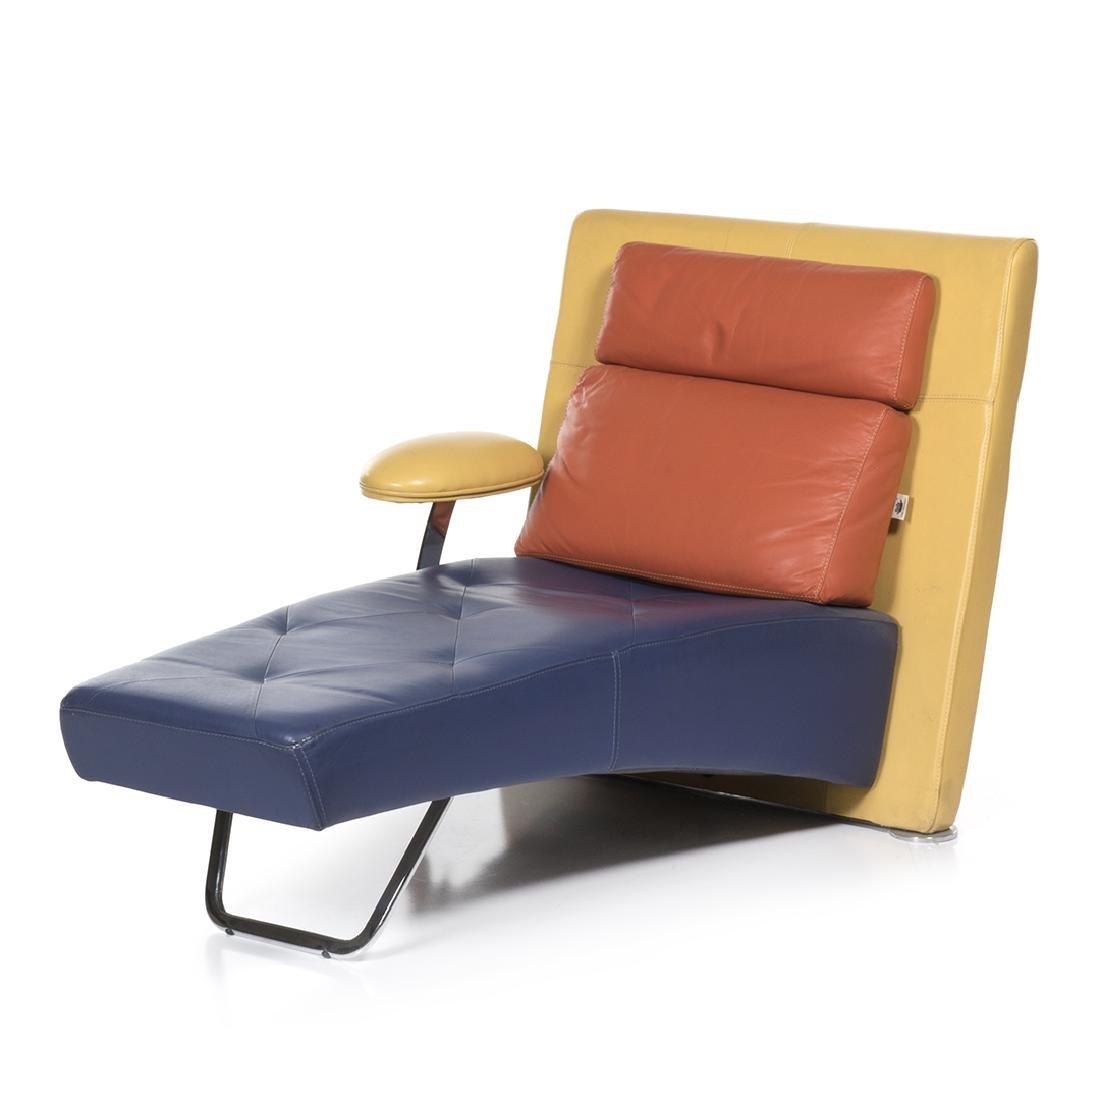 Gamma Arredamenti Chaise Lounge